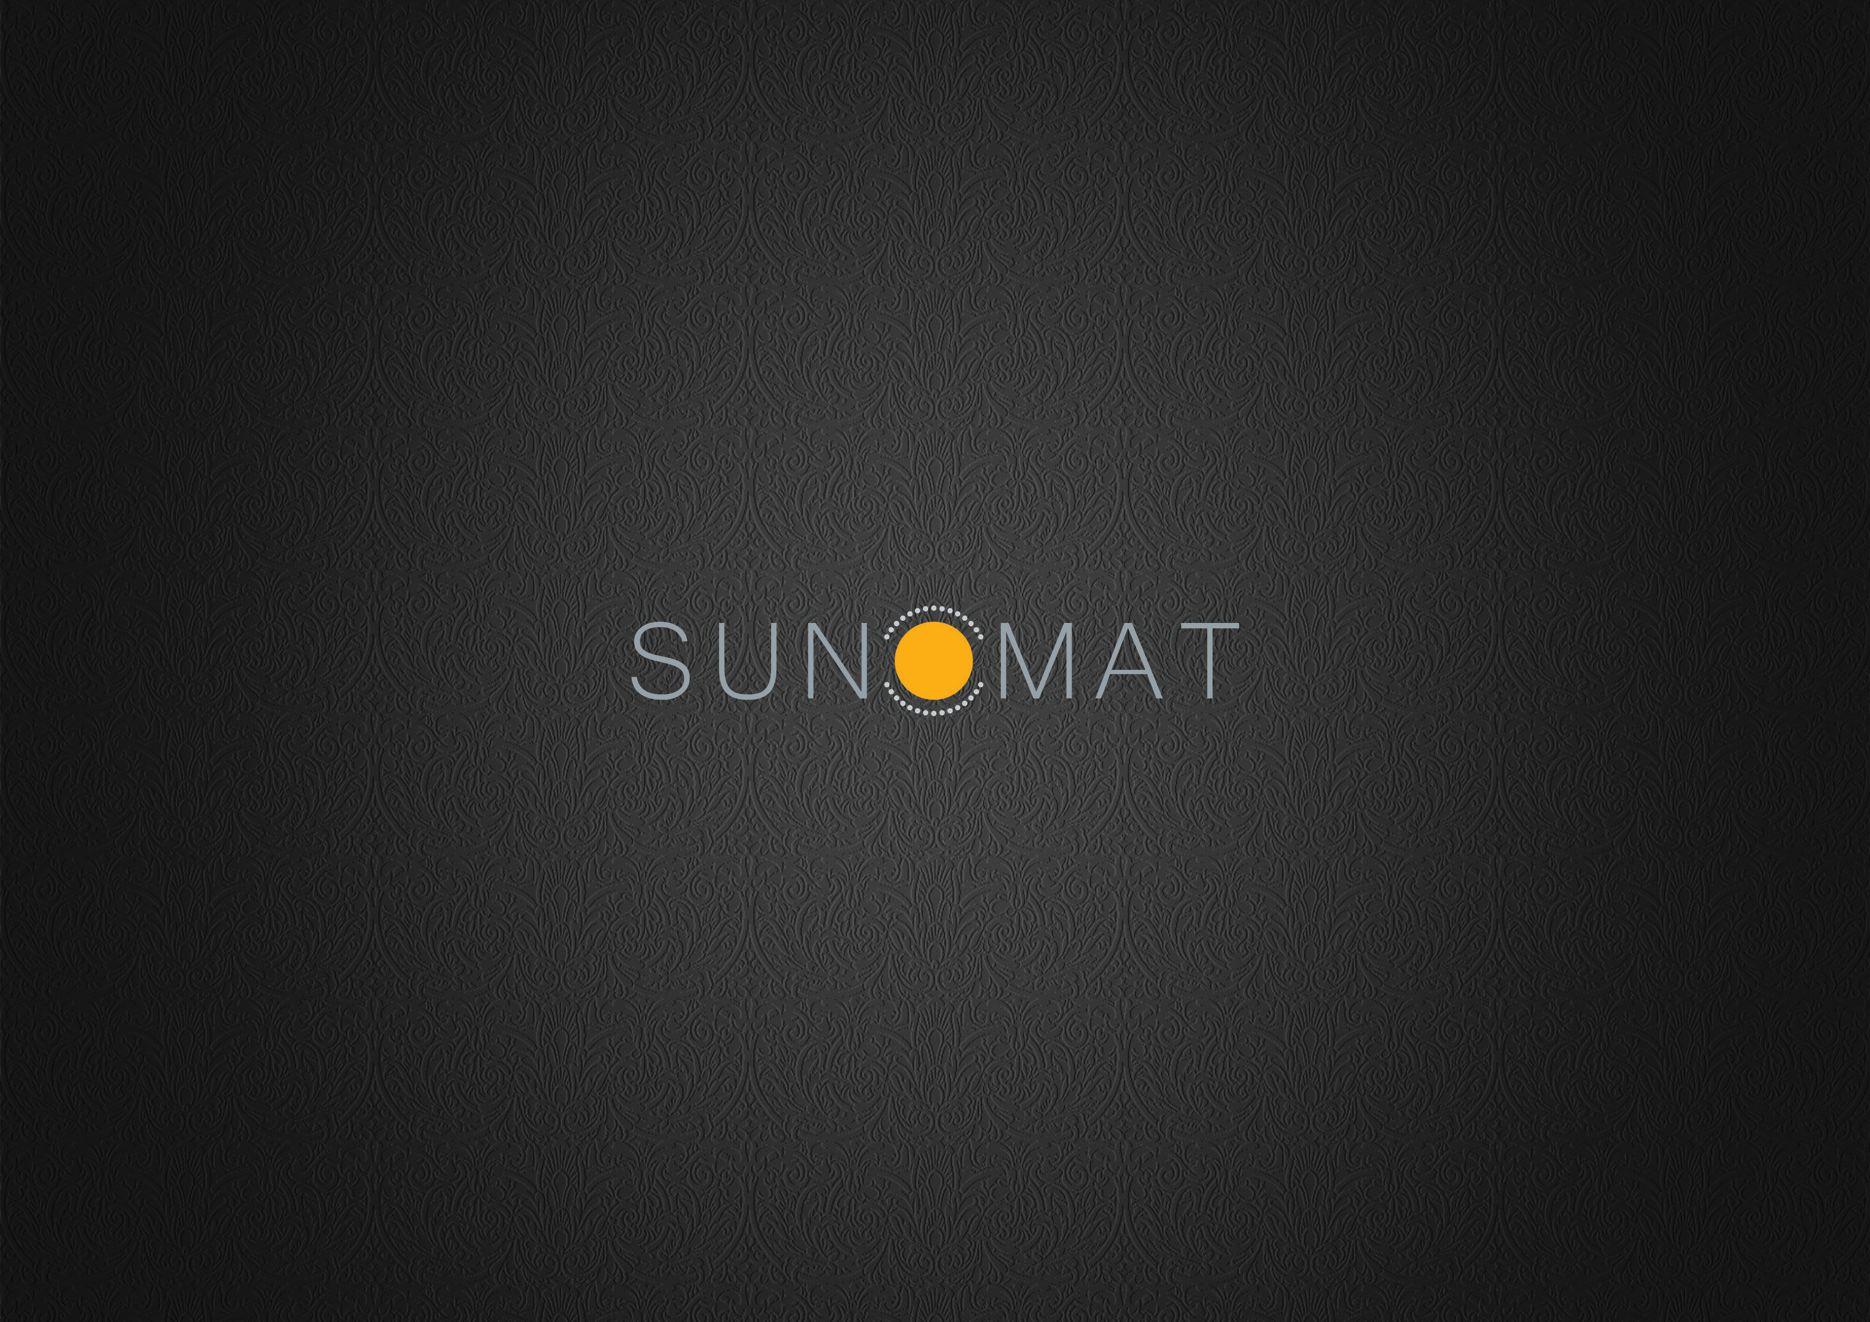 Sunomat02